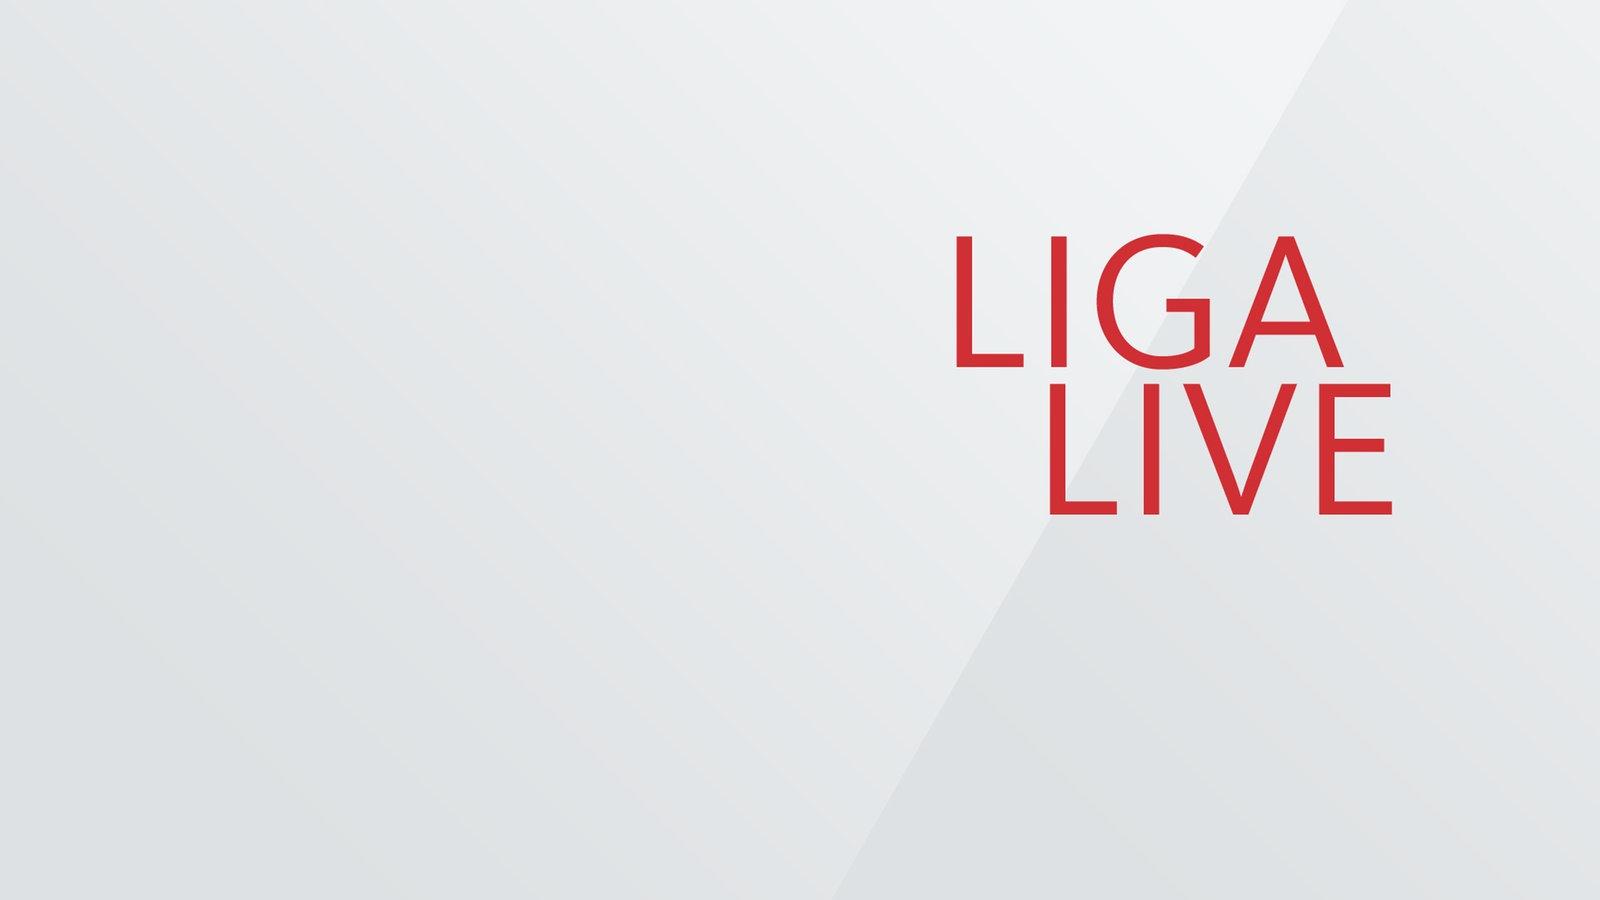 Liga Live Wdr